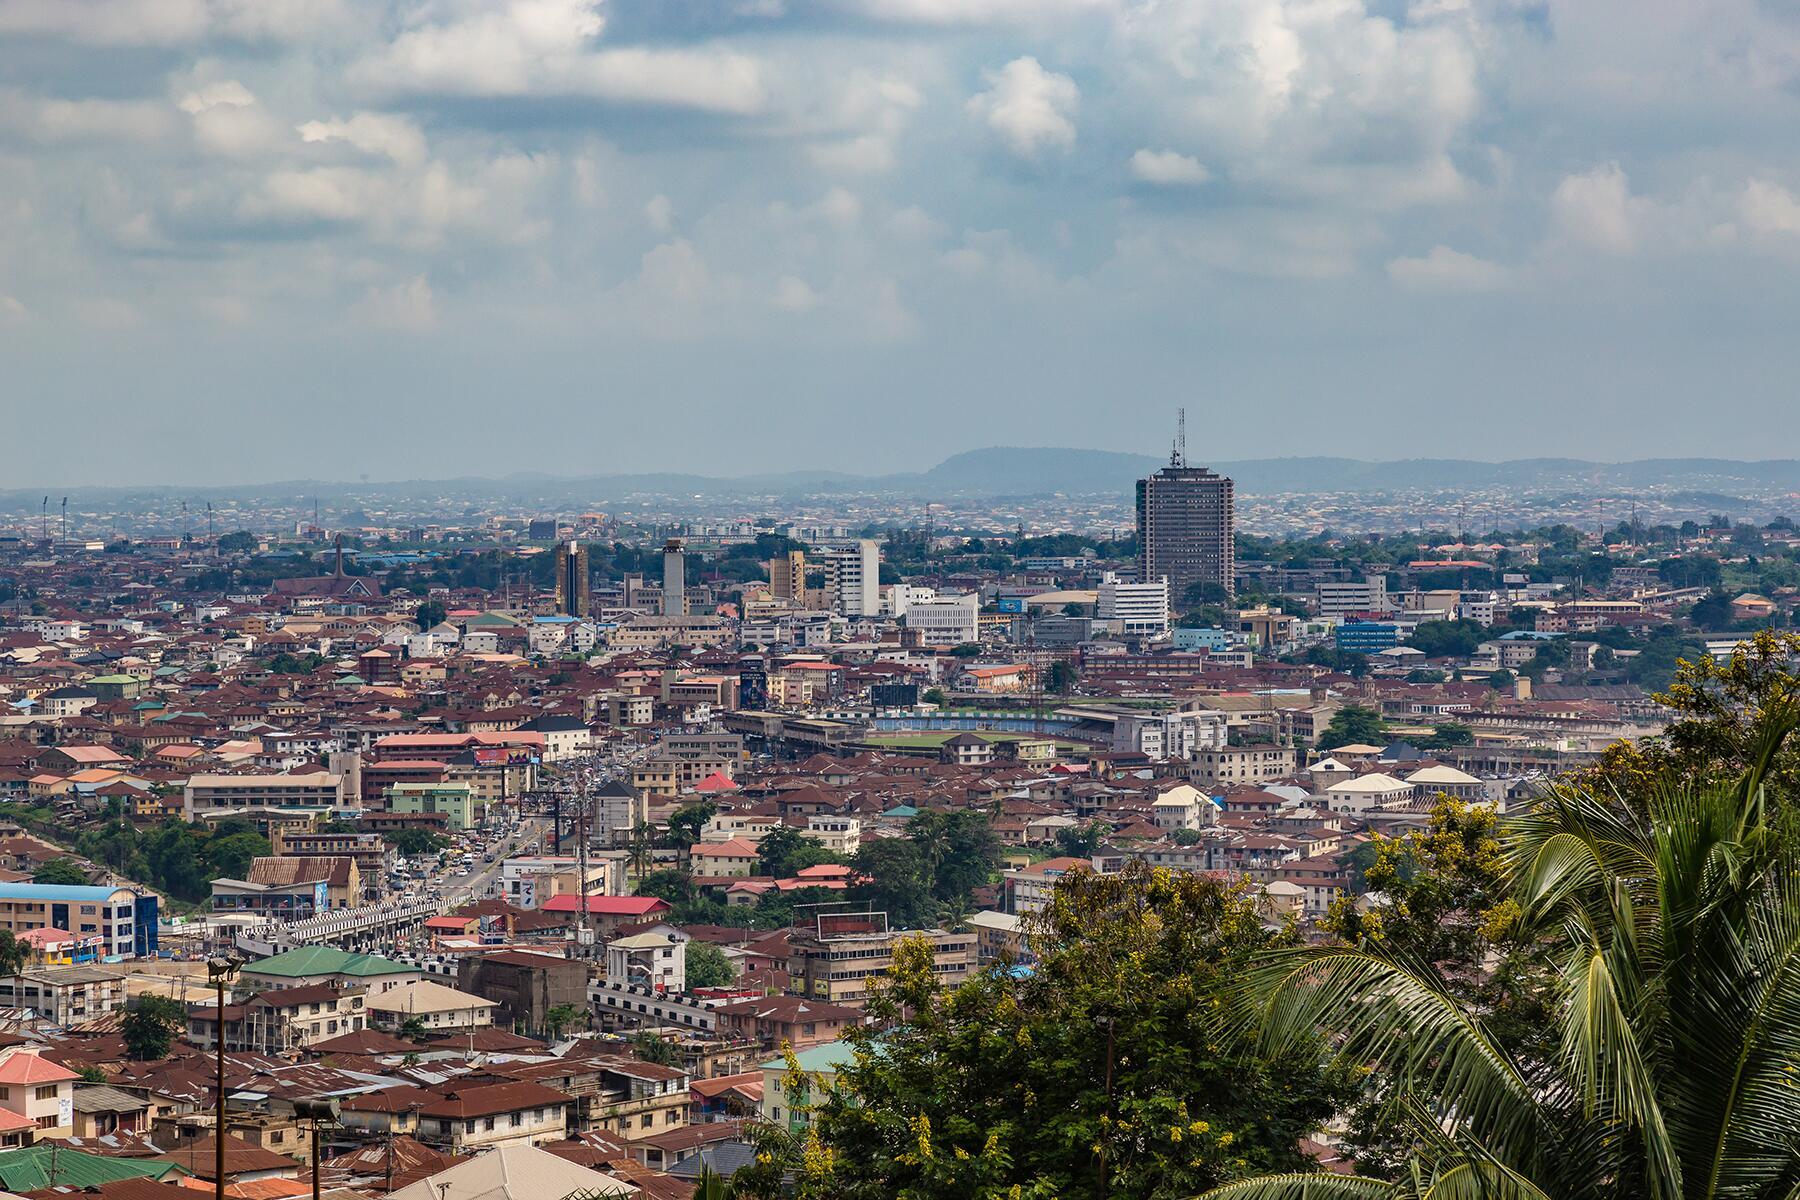 Ibadan - a city in Nigeria